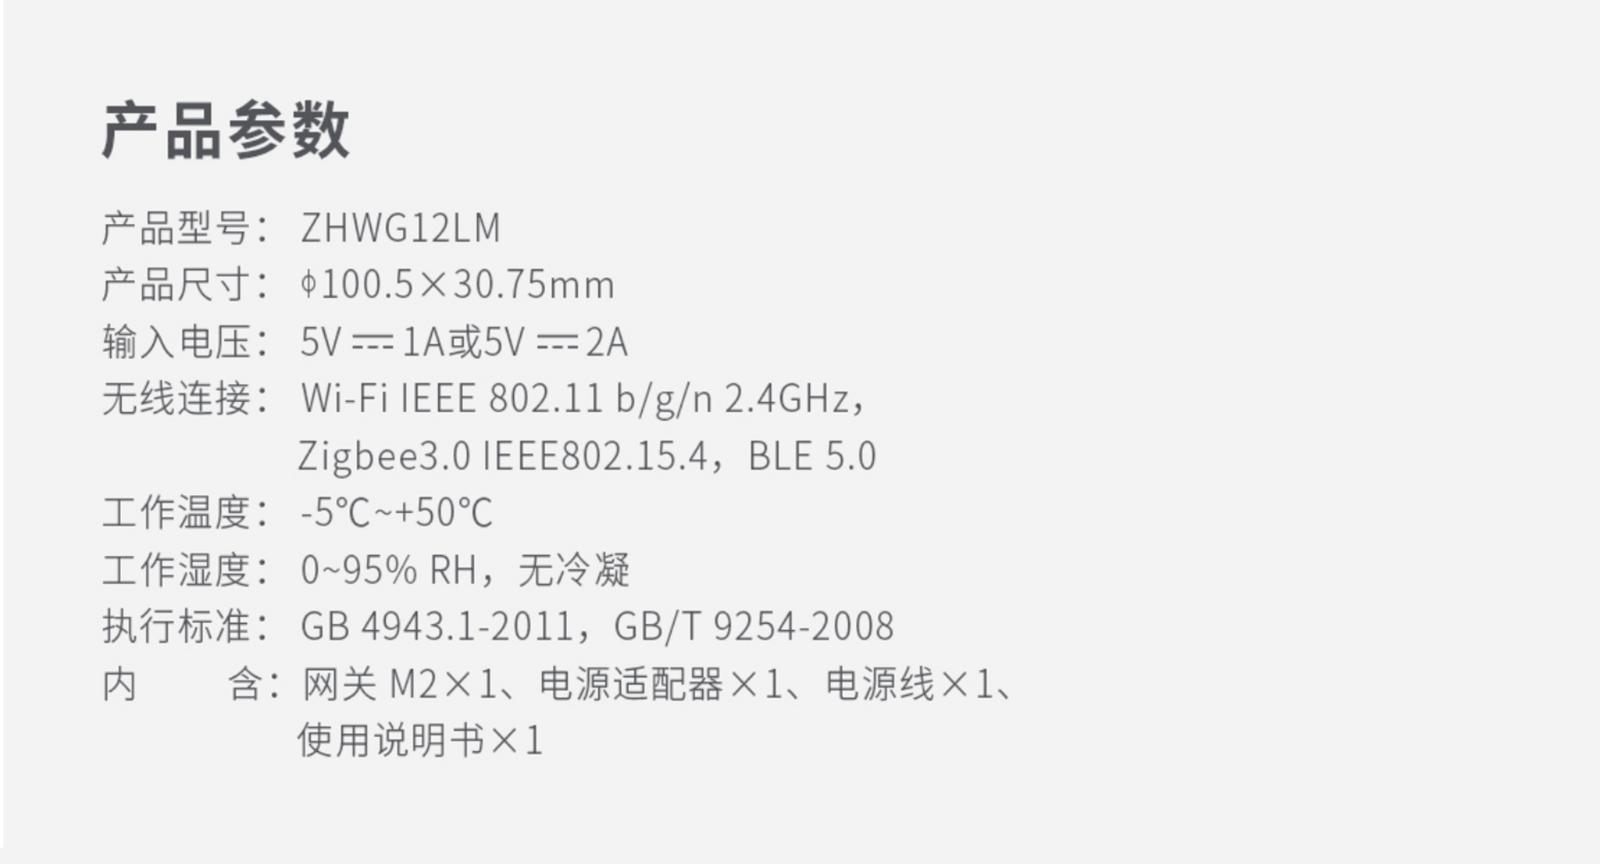 1600x_image.png?1597660909